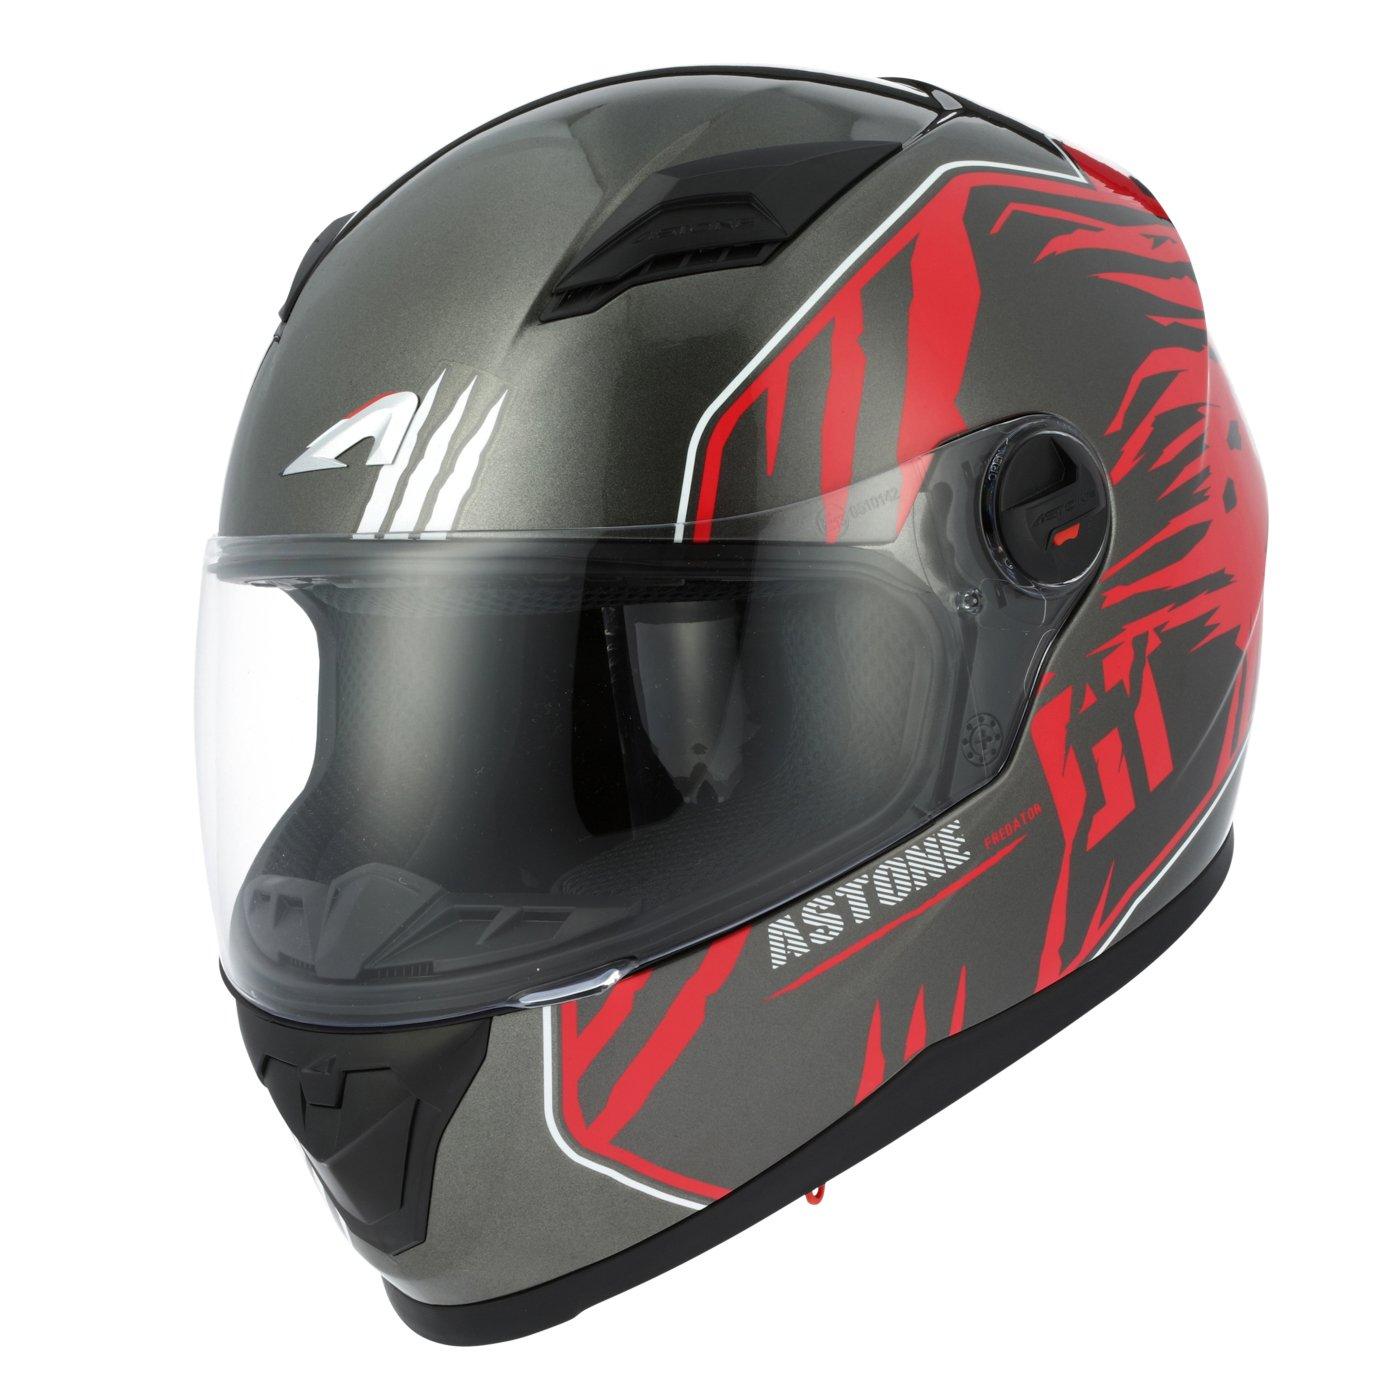 Amazon.es: Astone Helmets gt2g-predator-brl casco Moto Integral GT, negro/rojo, talla L